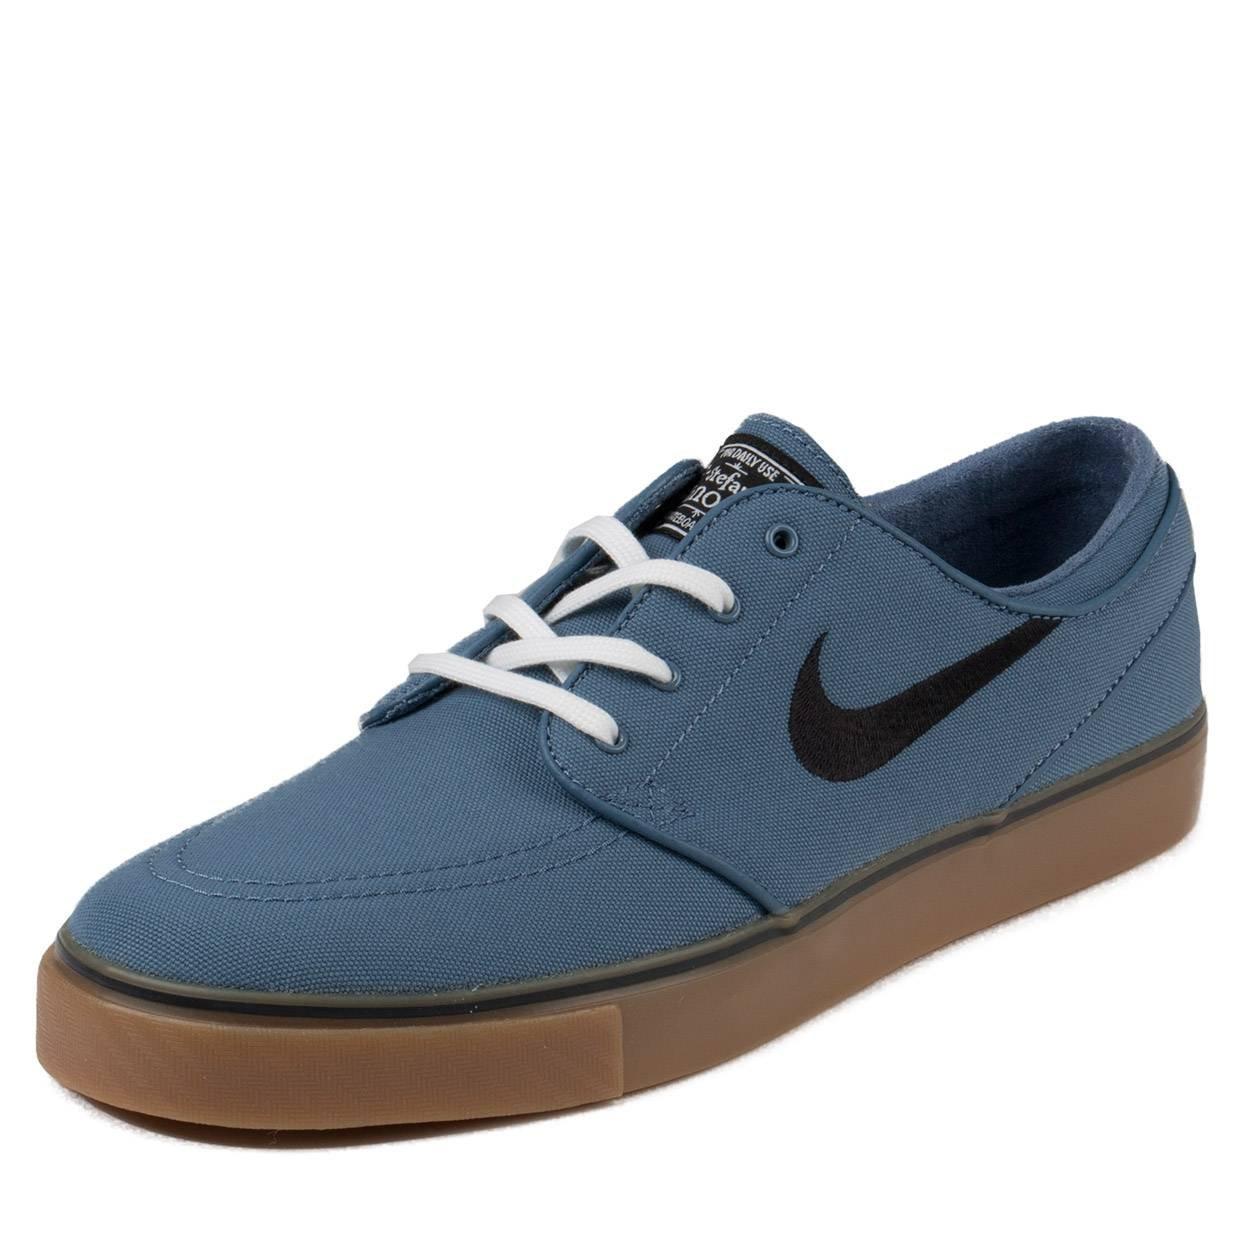 28726b868243 Galleon - Nike SB Air Zoom Stefan Janoski Canvas Ocean Fog White Gum Light  Brown Black Skate Shoes-Men 9.5